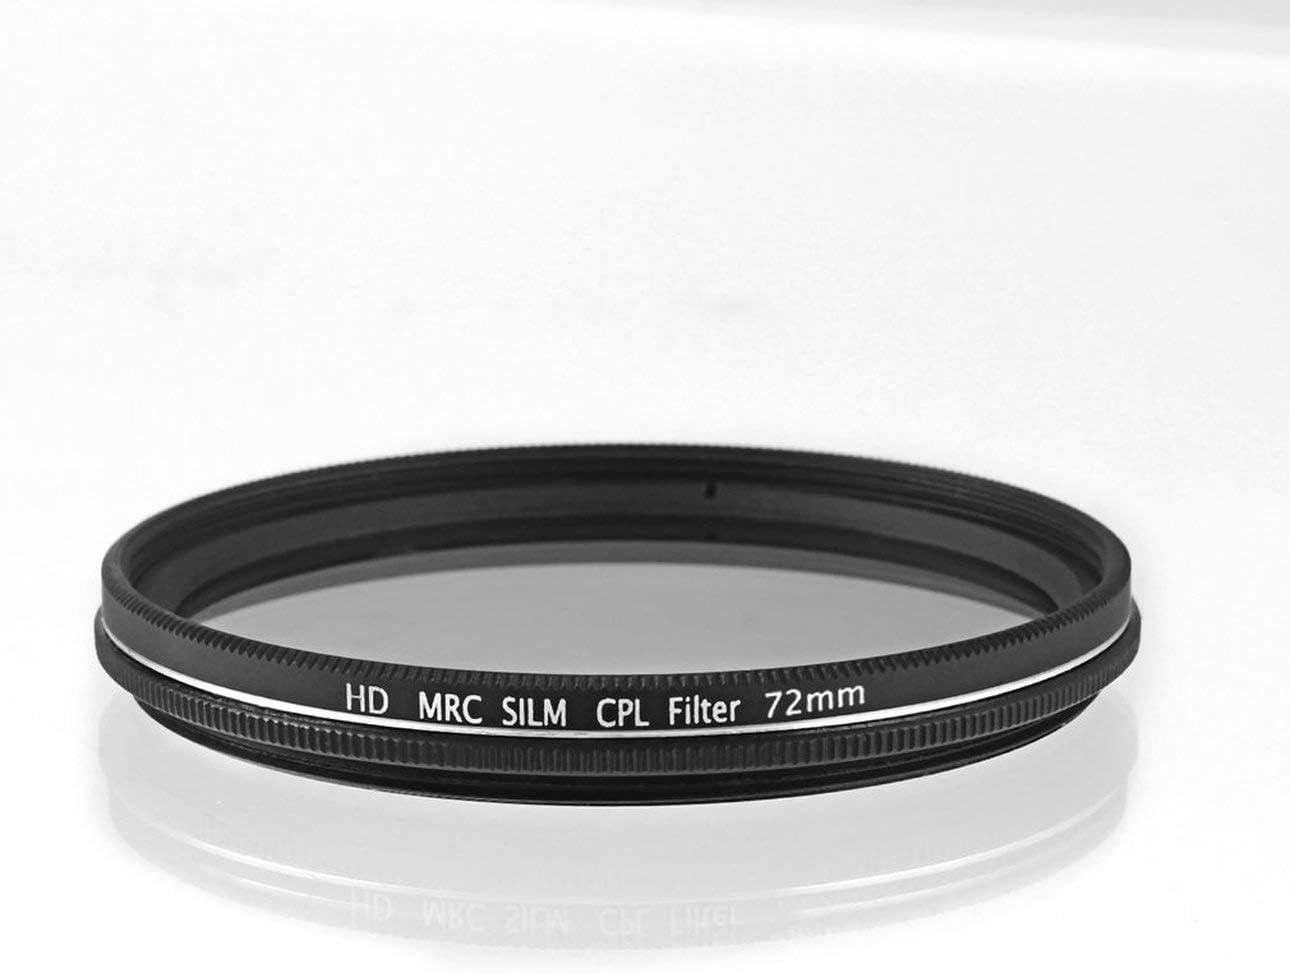 Liobaba Professional Photography Filter Kit Waterproof Super Thin Circular Polarizer for Camera Lens